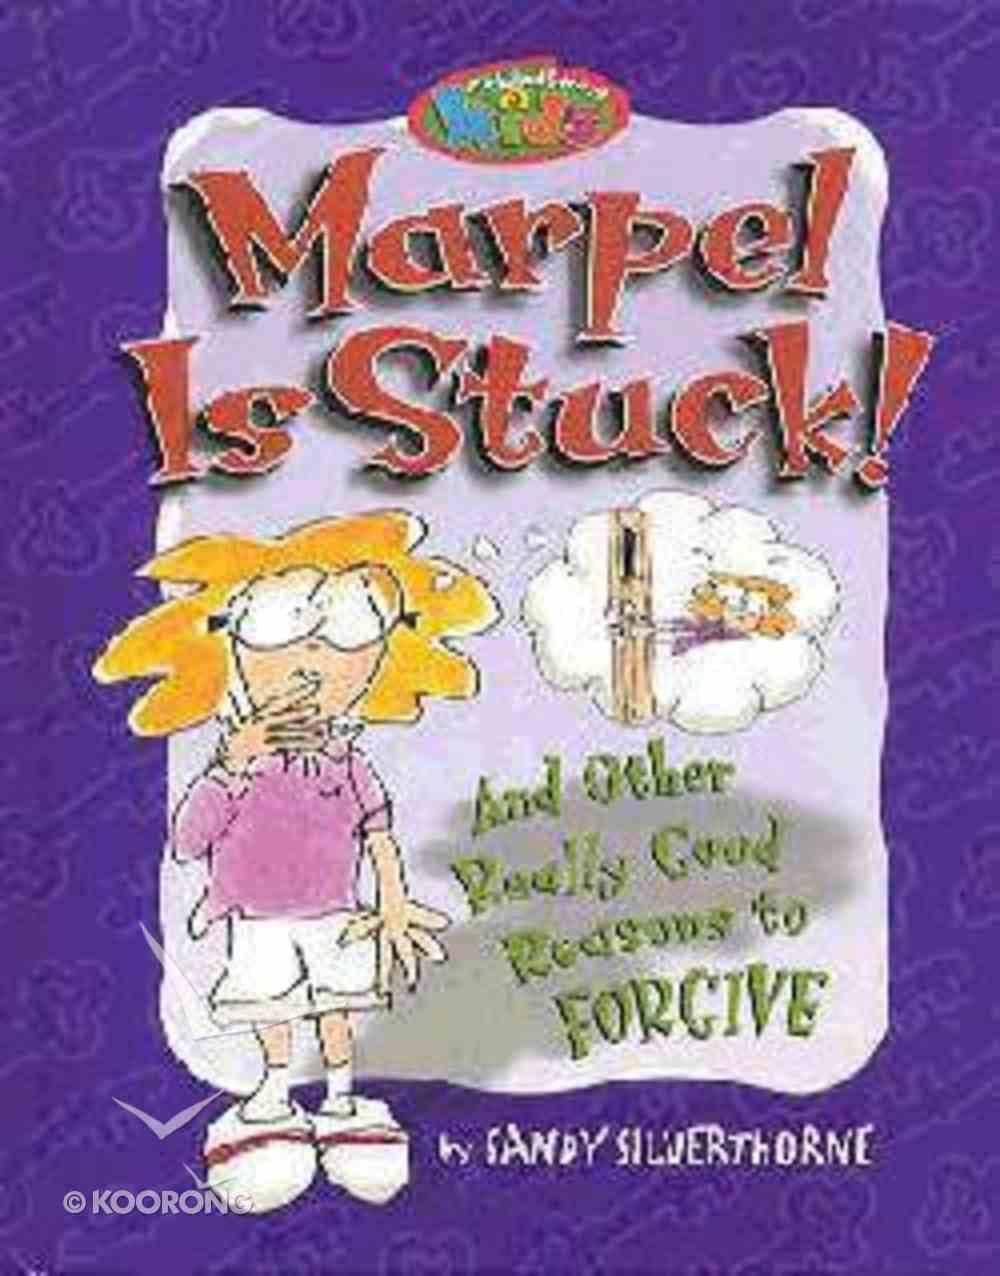 Marpel is Stuck! (Kirkland Street Kids Series) Hardback